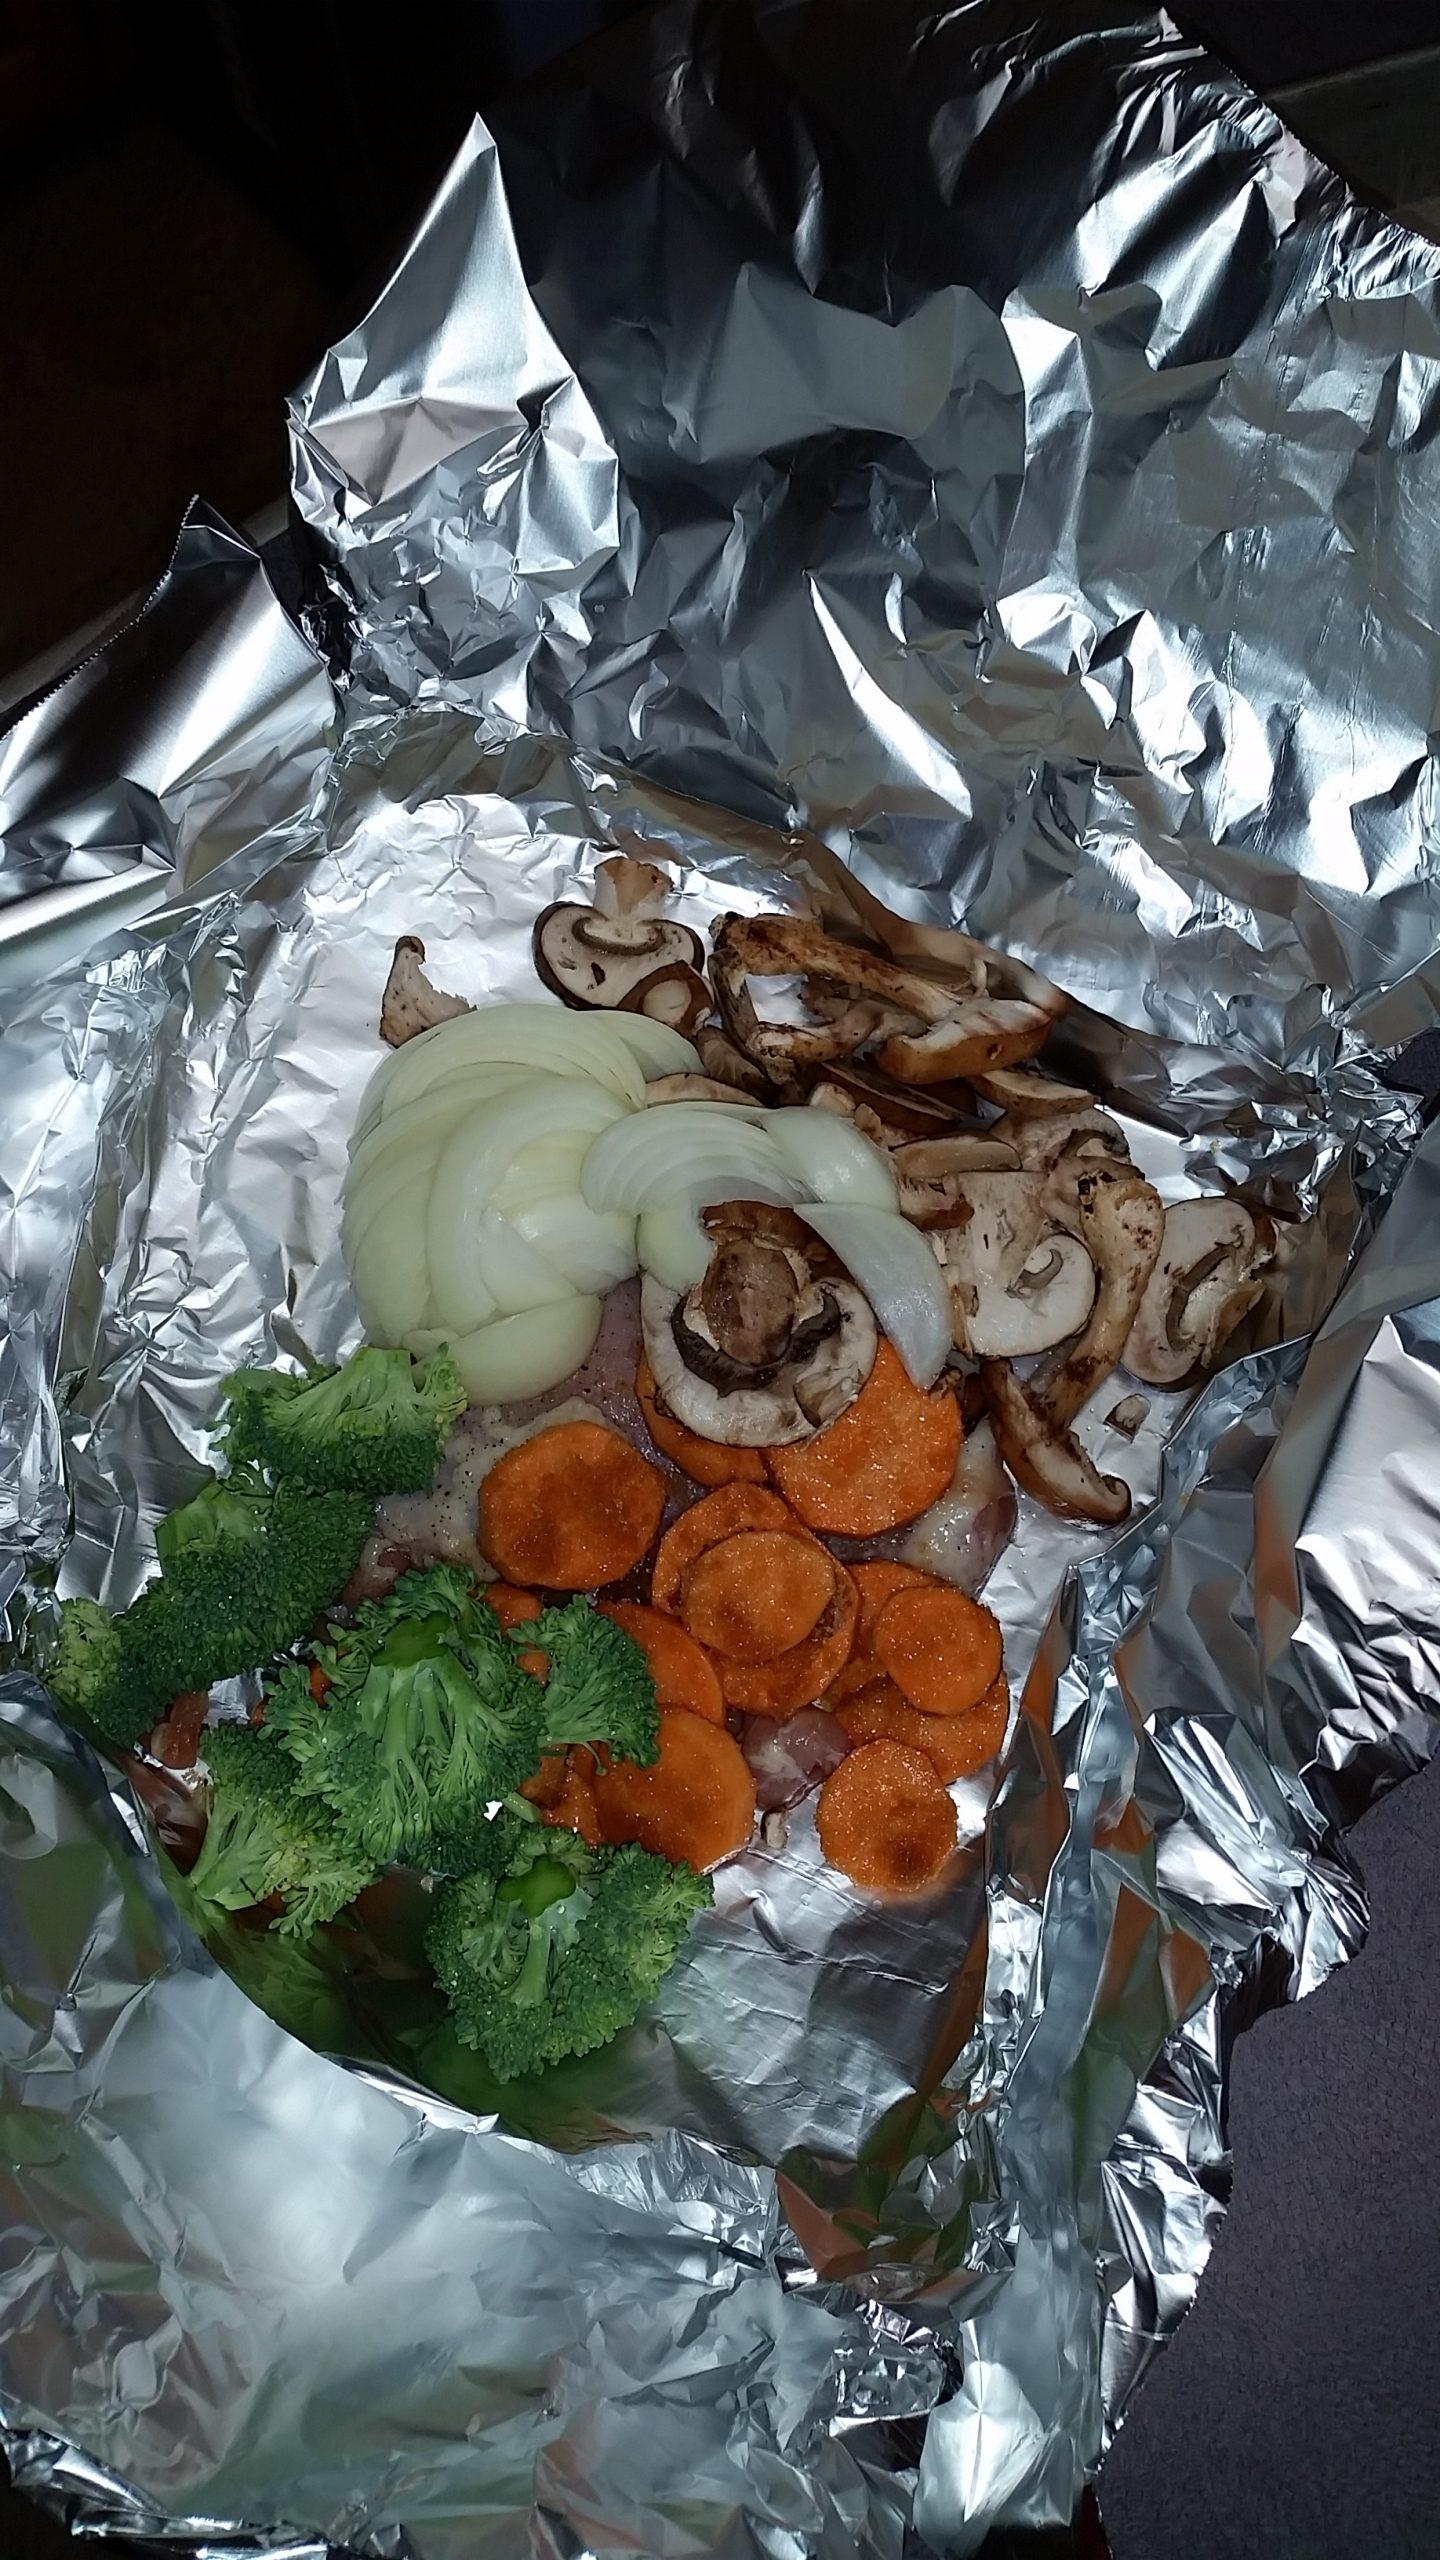 Broccoli Yams & Chicken thigh foil packet dinner